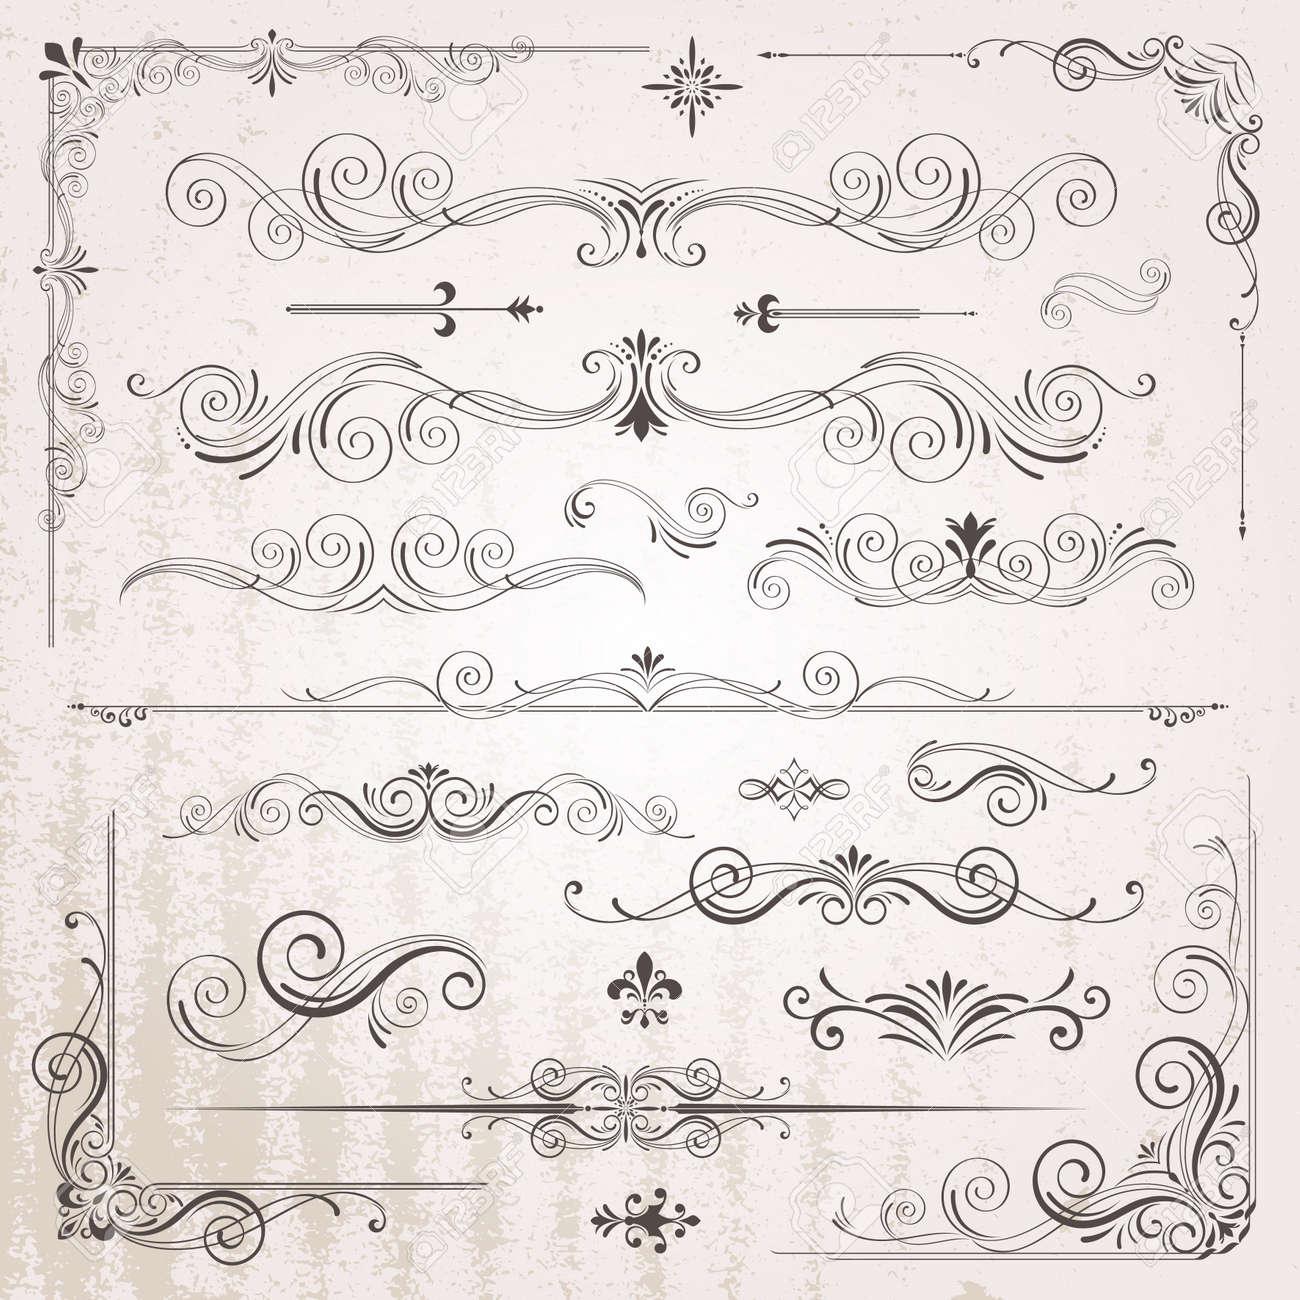 Vintage frames and scroll elements - 52745479